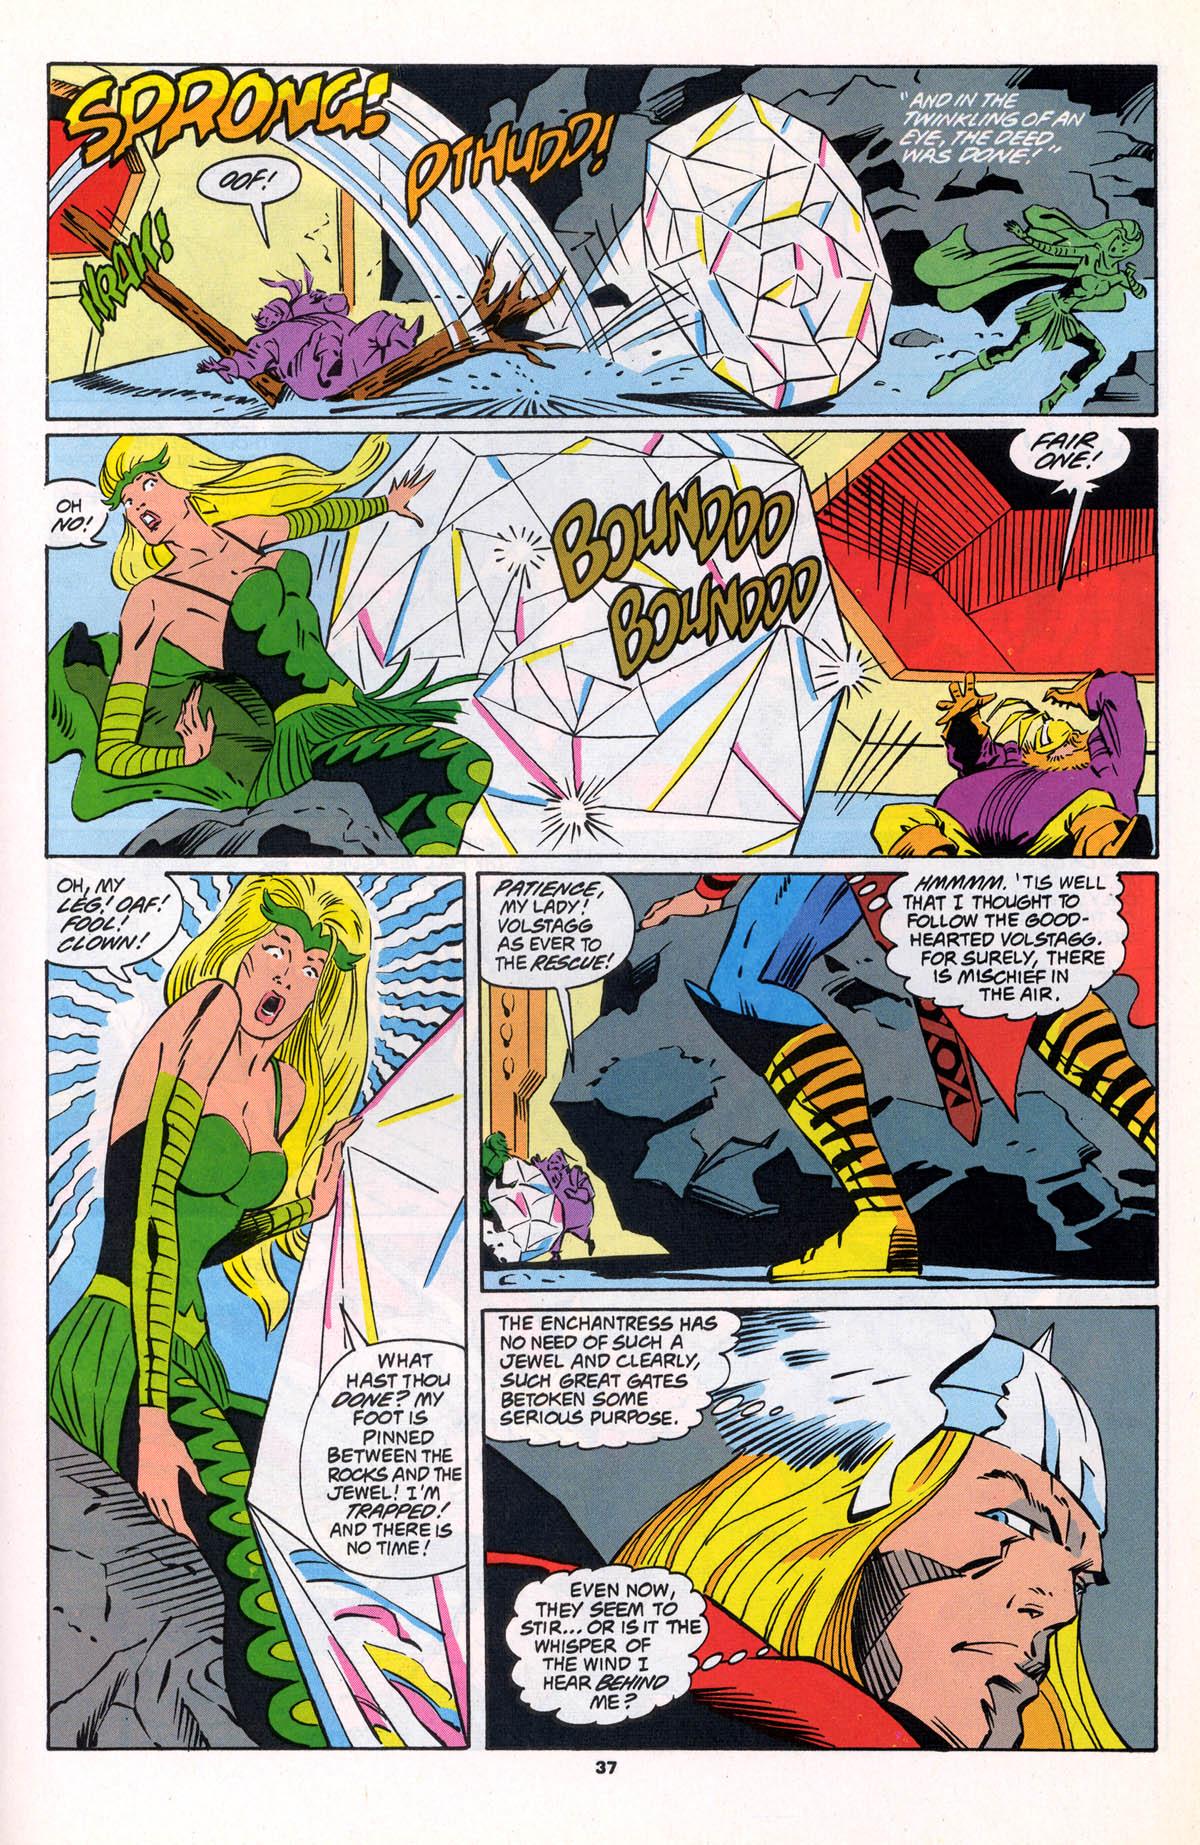 Marvel Super Heroes (1990) #15 pg 37, penciled by Joe Barney & inked by Frank Turner.